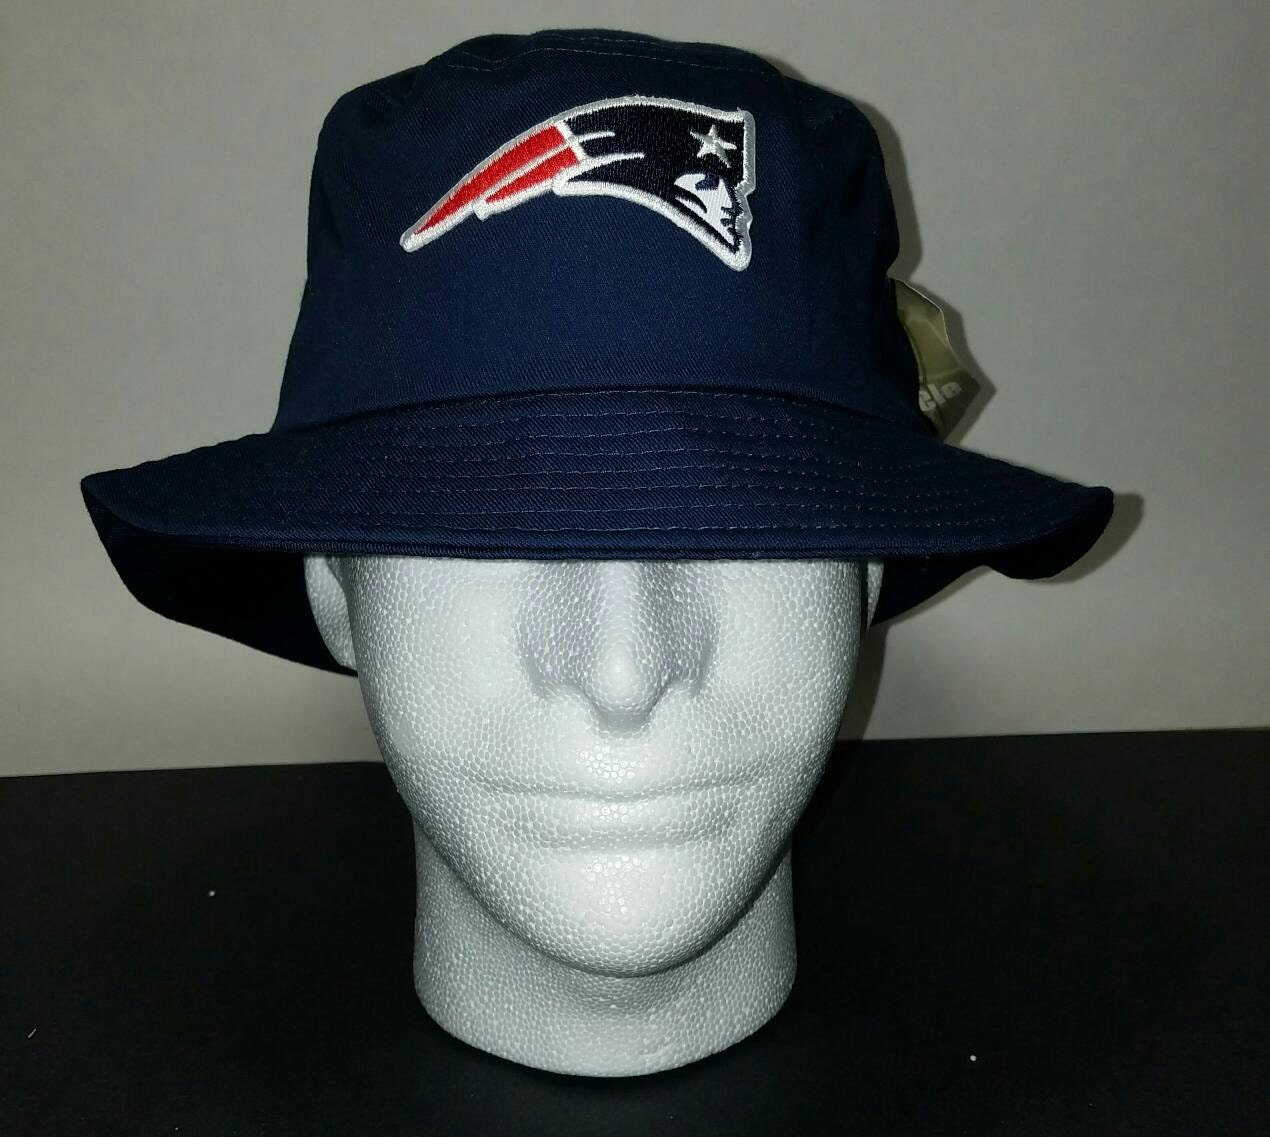 0de36d21c7b31 ... coupon code for lyst mcm visetos logo stud cap in brown patriots bucket  hats navy color